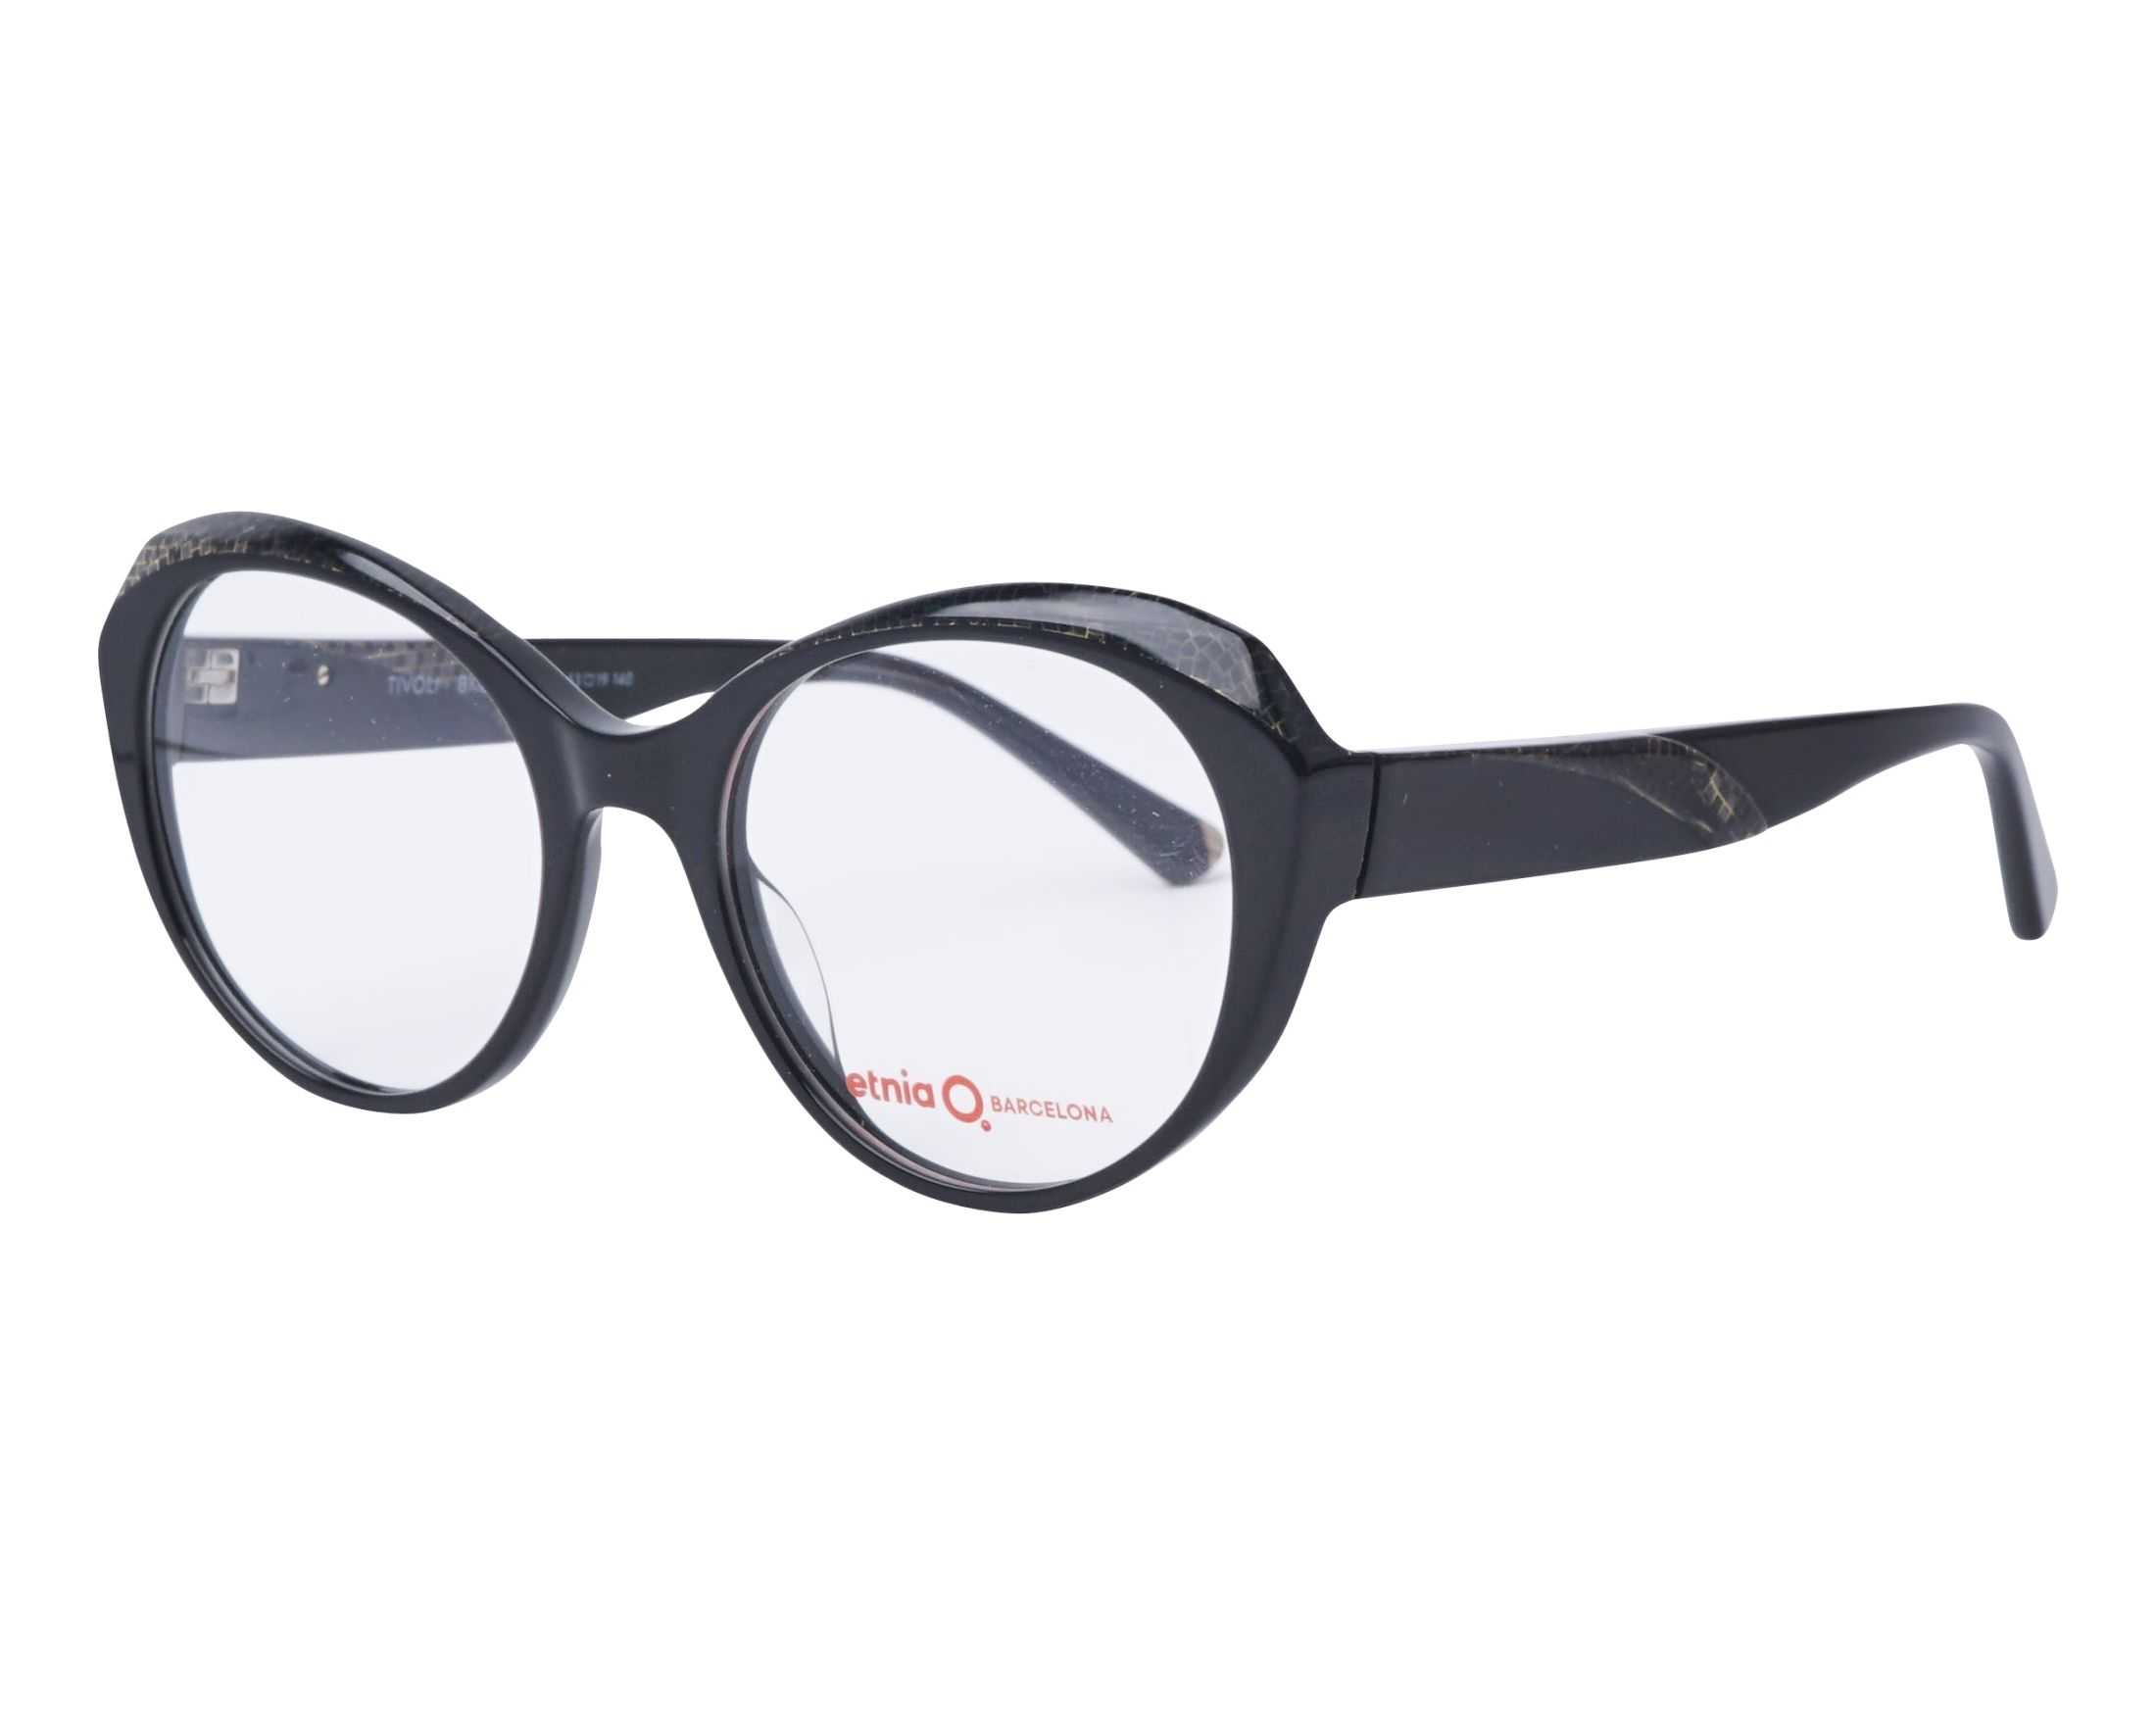 a7f8eab147d eyeglasses Etnia Barcelona TIVOLI BKCH - Black Gold profile view